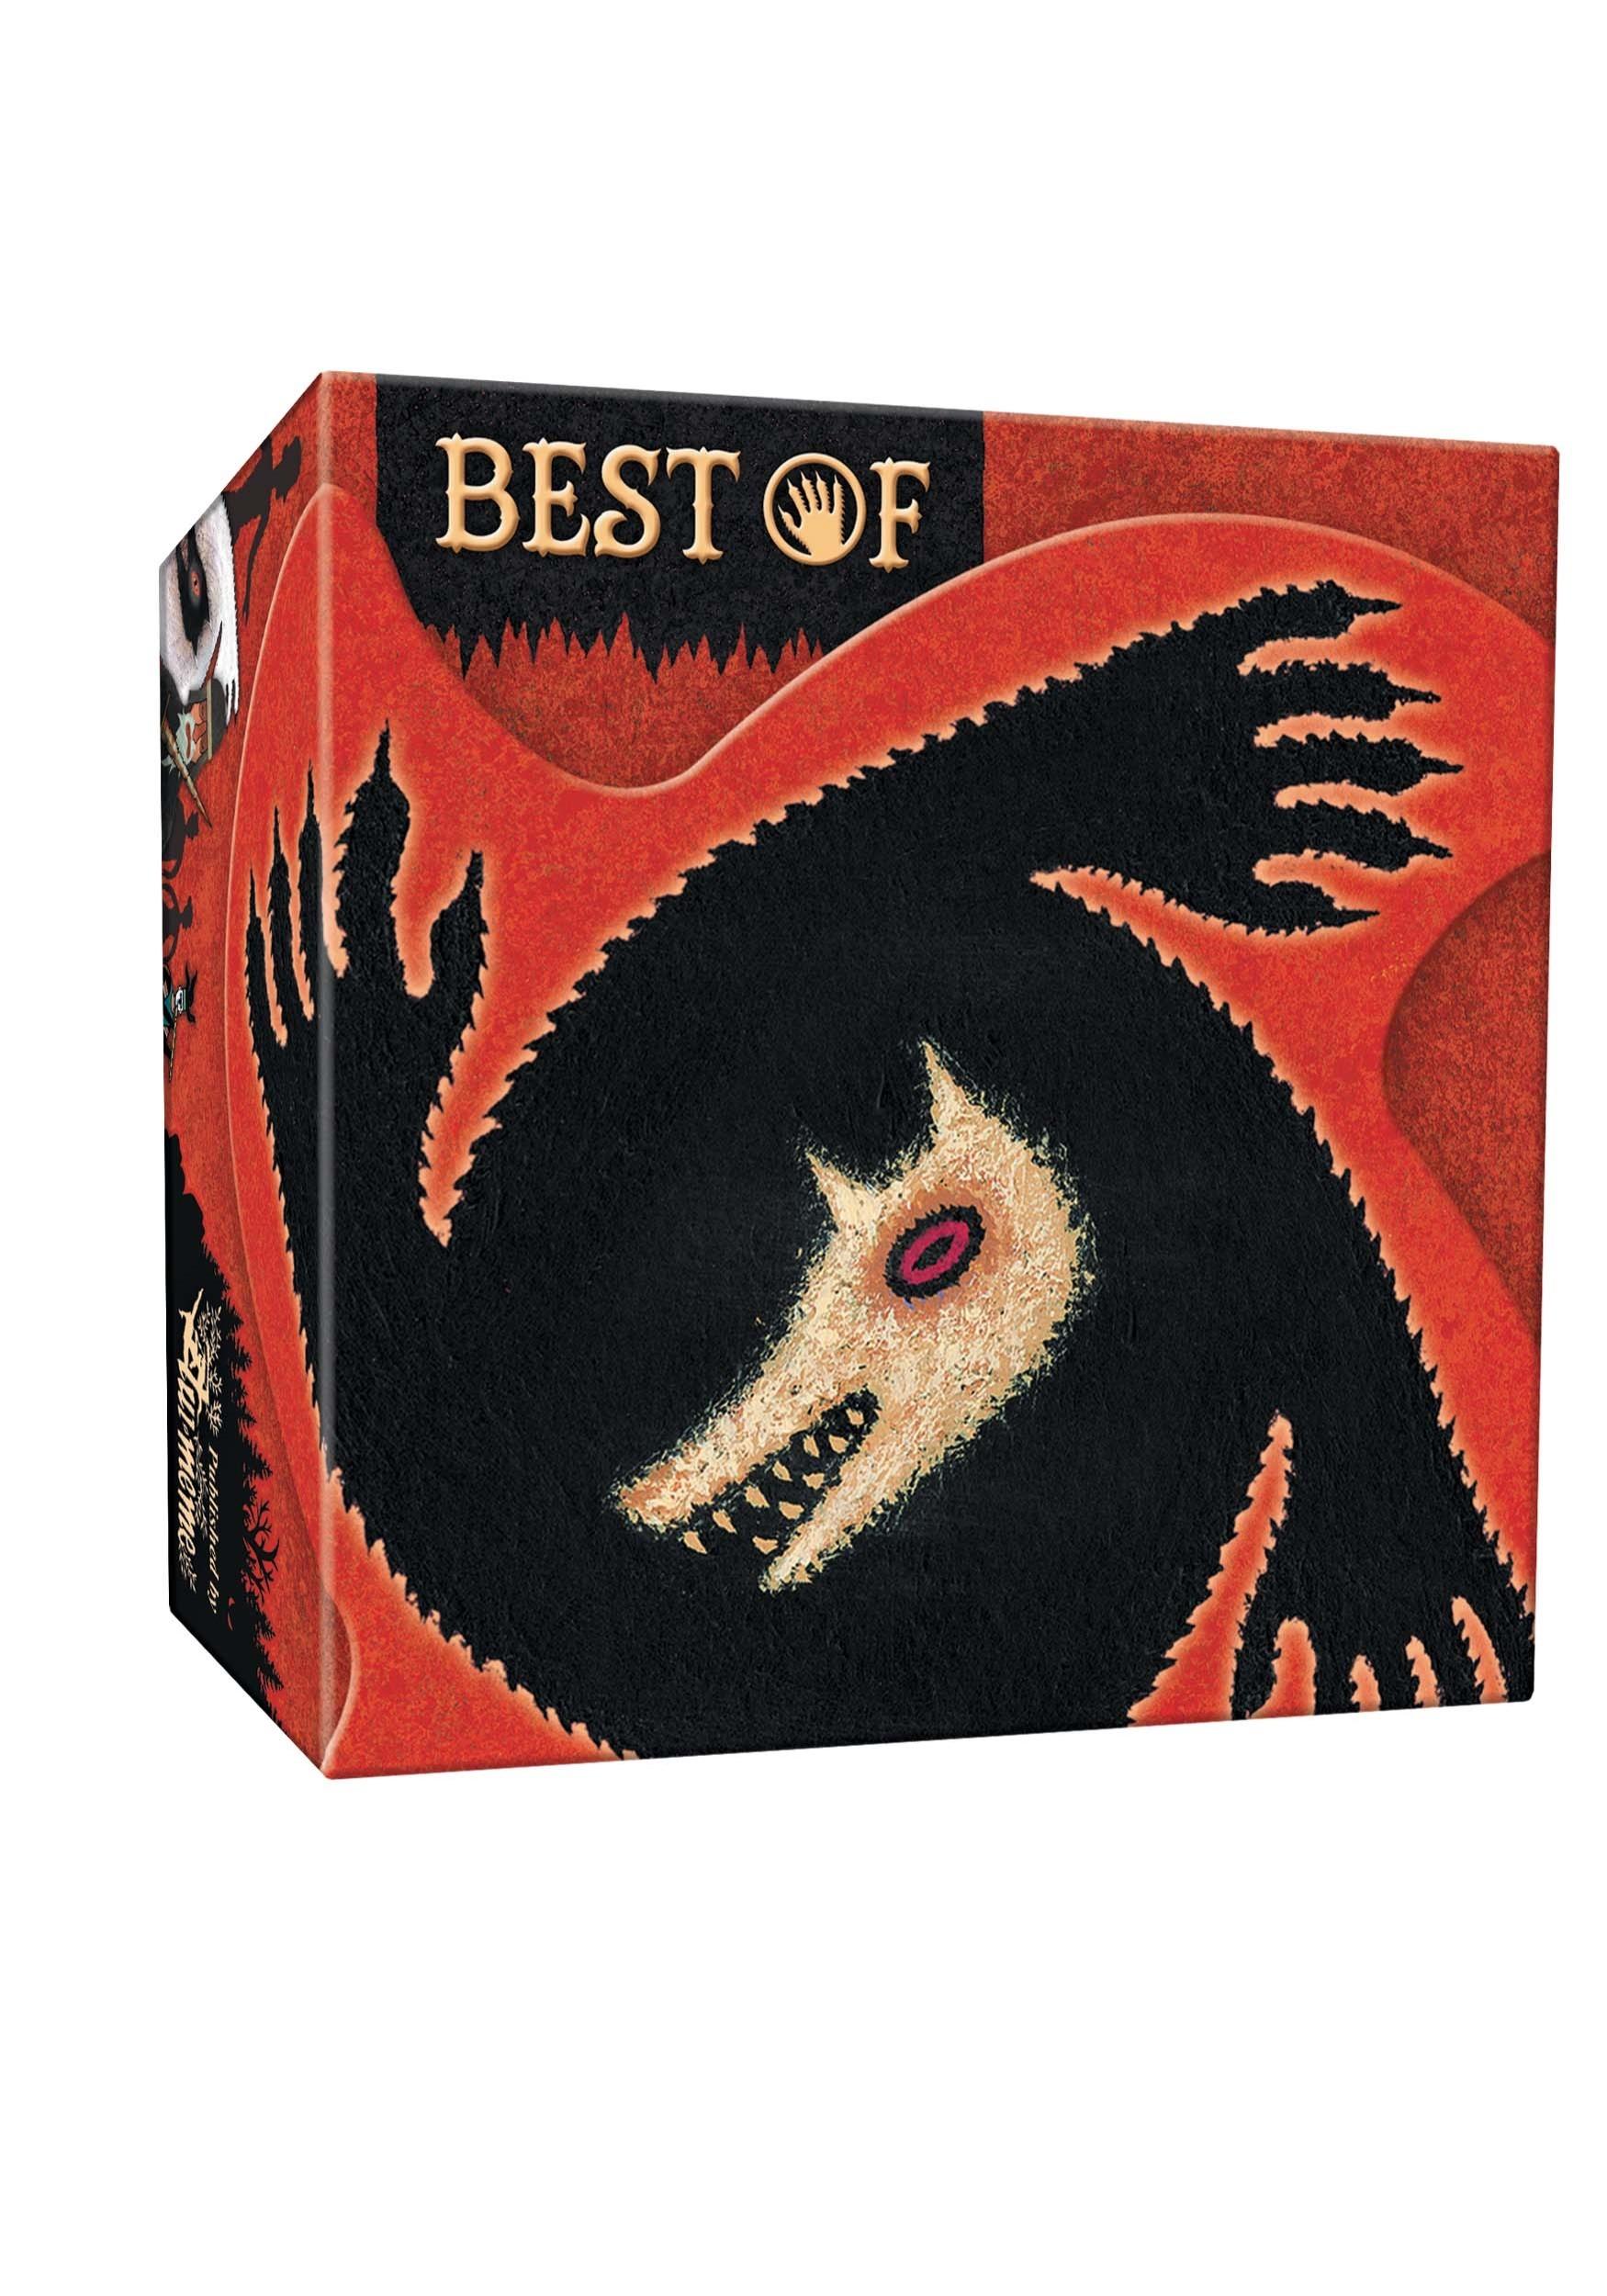 Best of Werewolves of Miller's Hollow Card Game